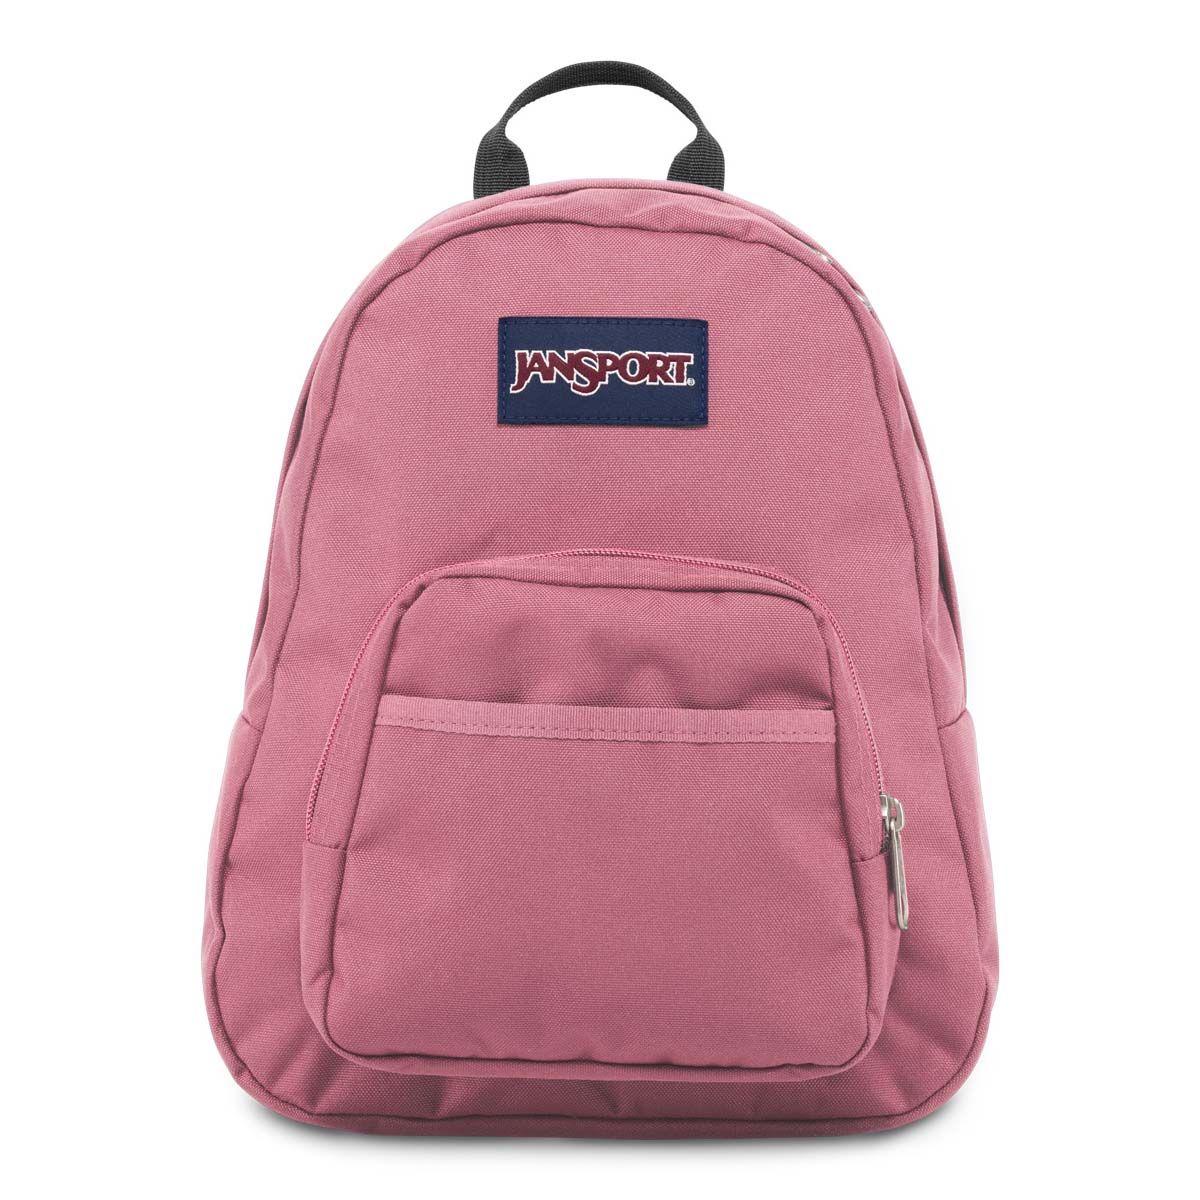 JanSport Half Pint Mini Backpack in Blackberry Mousse